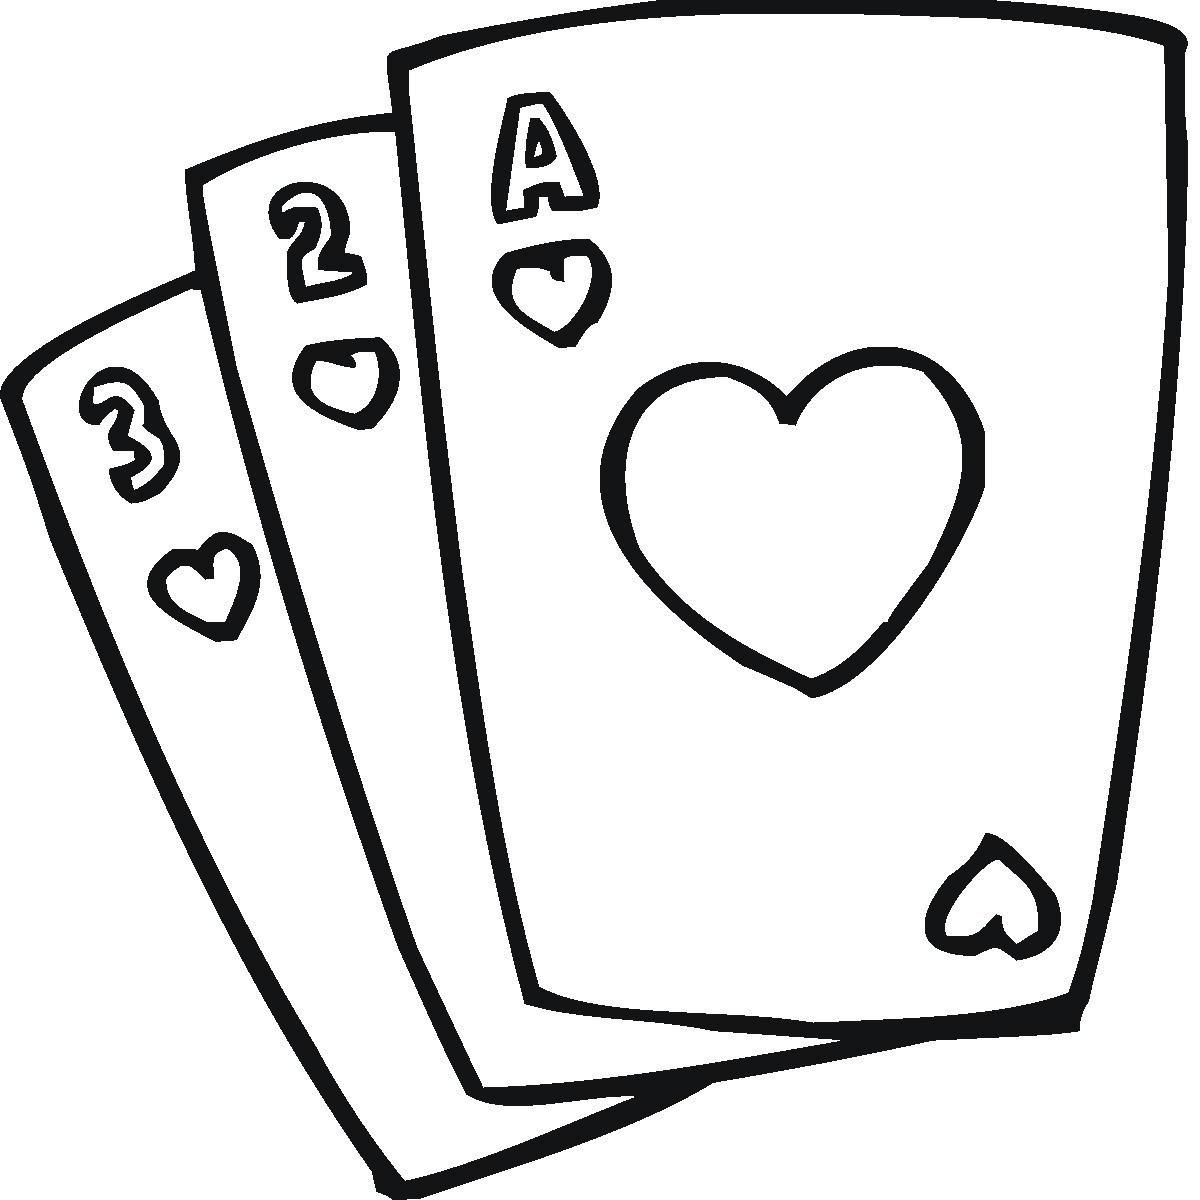 Deck of card clipart 3 » Clipart Portal.